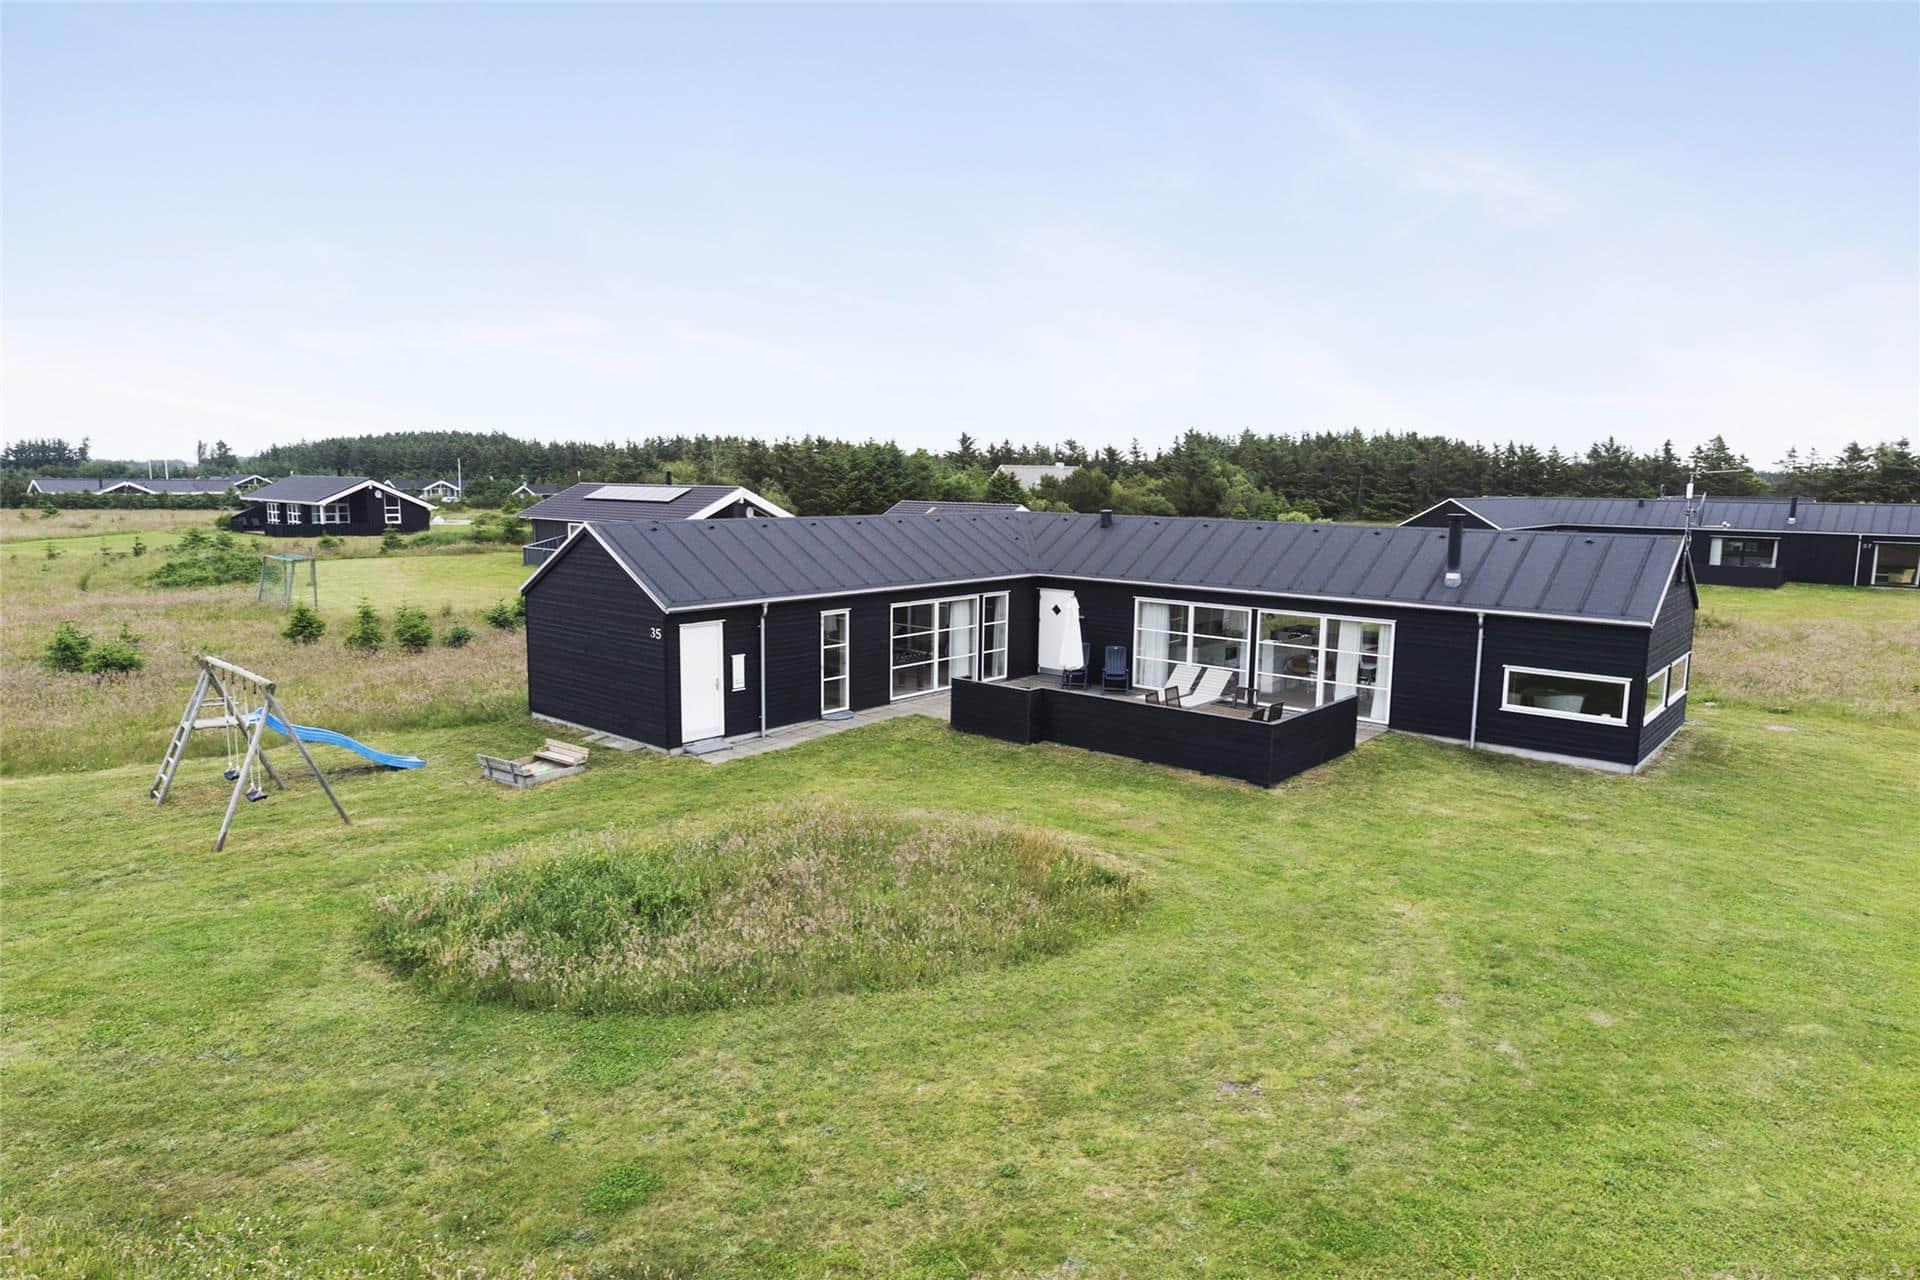 Billede 1-14 Sommerhus 796, Alexandravej 35, DK - 9480 Løkken